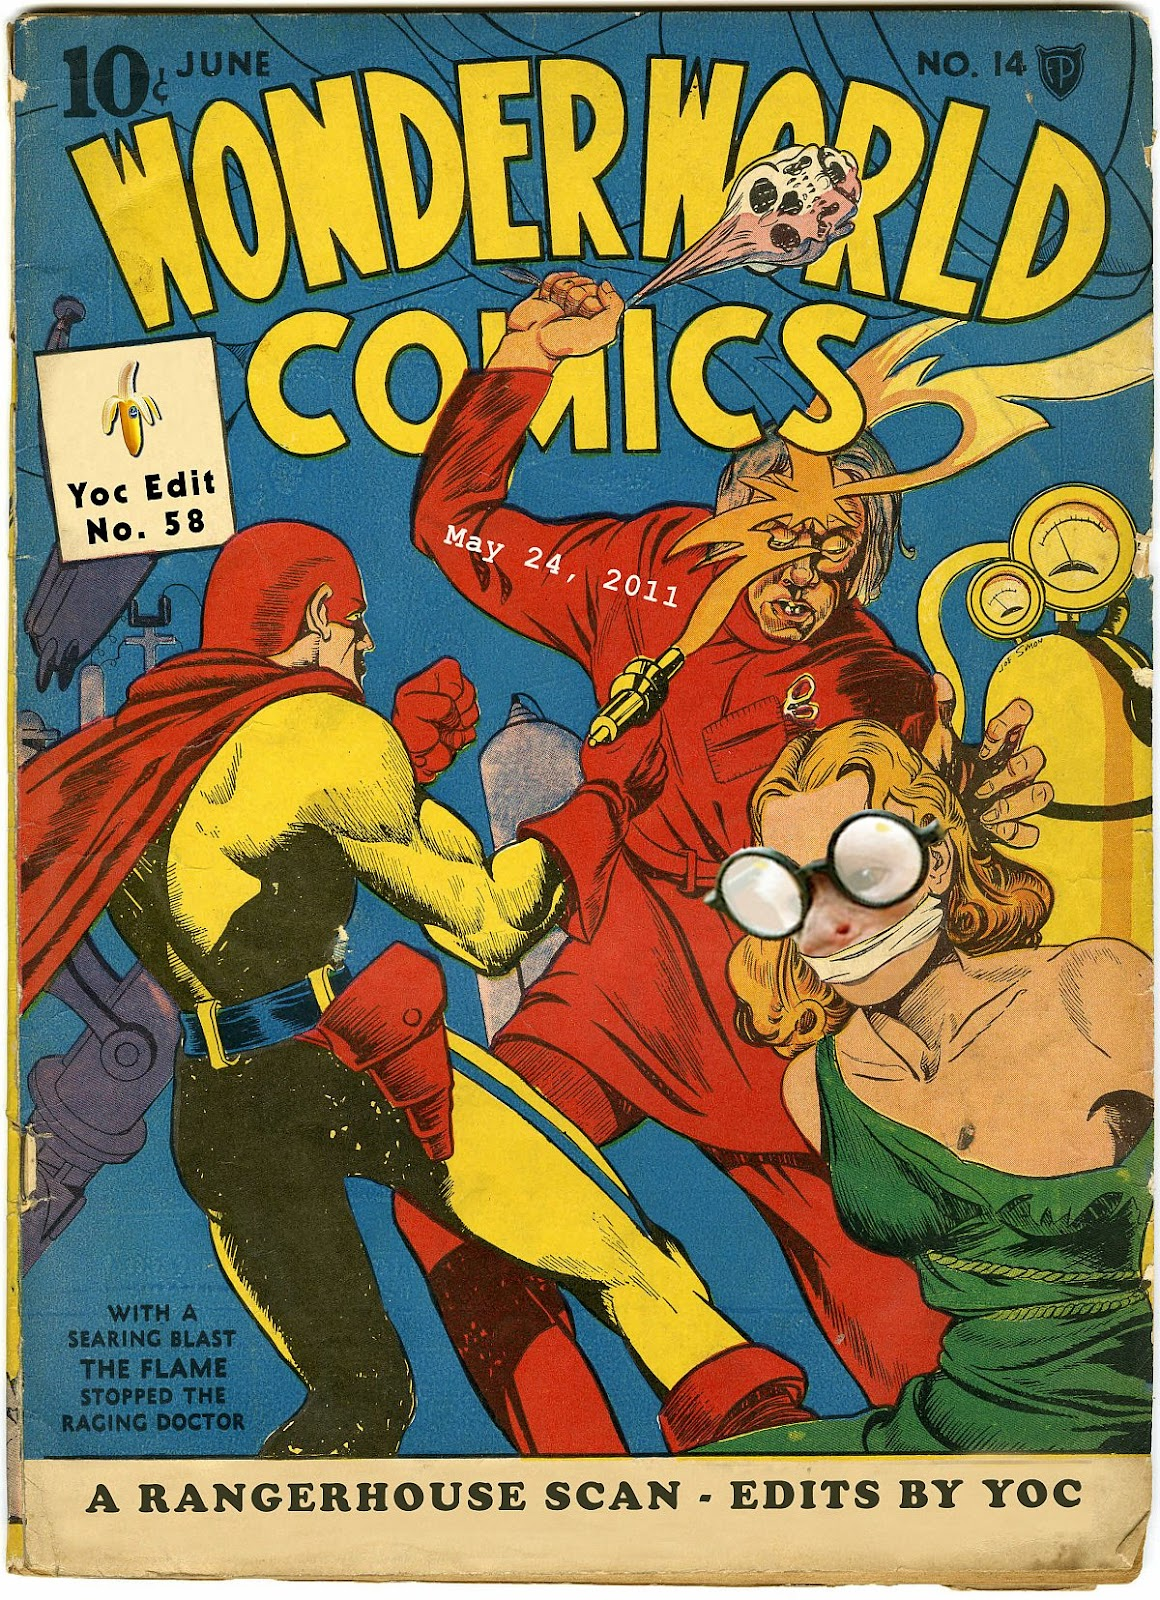 Wonderworld Comics issue 14 - Page 70